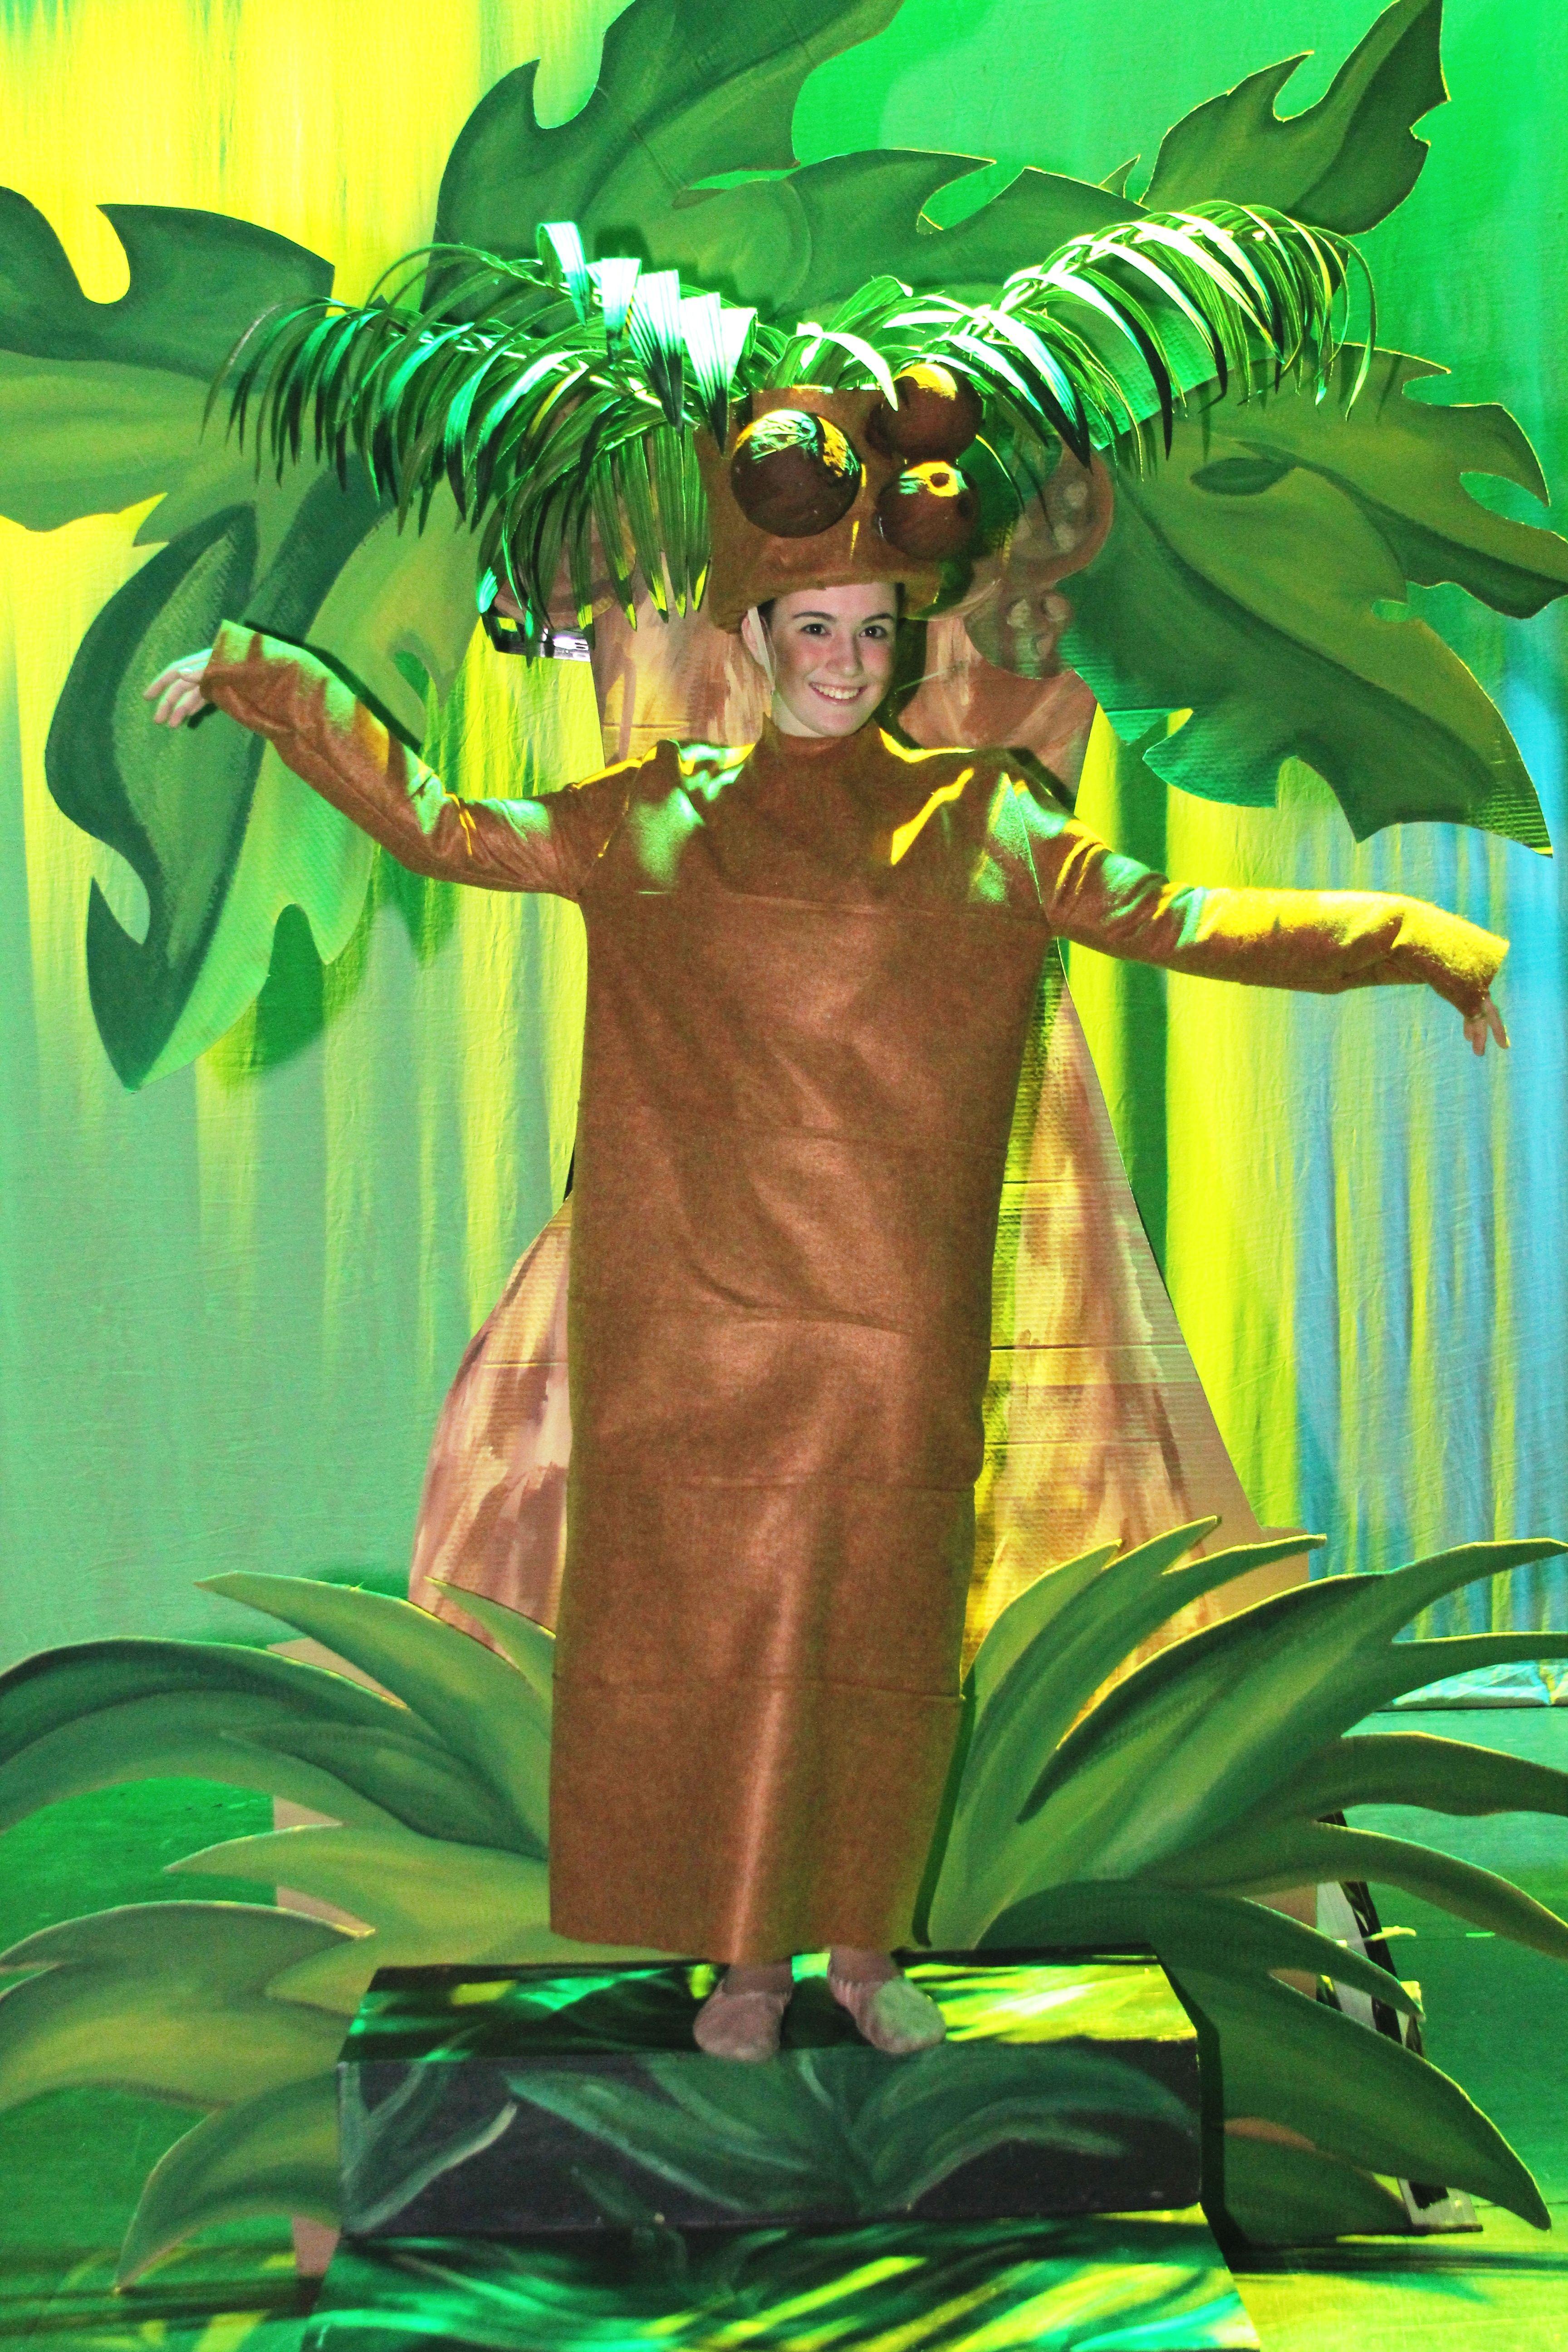 Coconut Tree Jungle Book Ovations Dance Repertory Company  sc 1 st  Pinterest & Coconut Tree Jungle Book Ovations Dance Repertory Company | Costumes ...